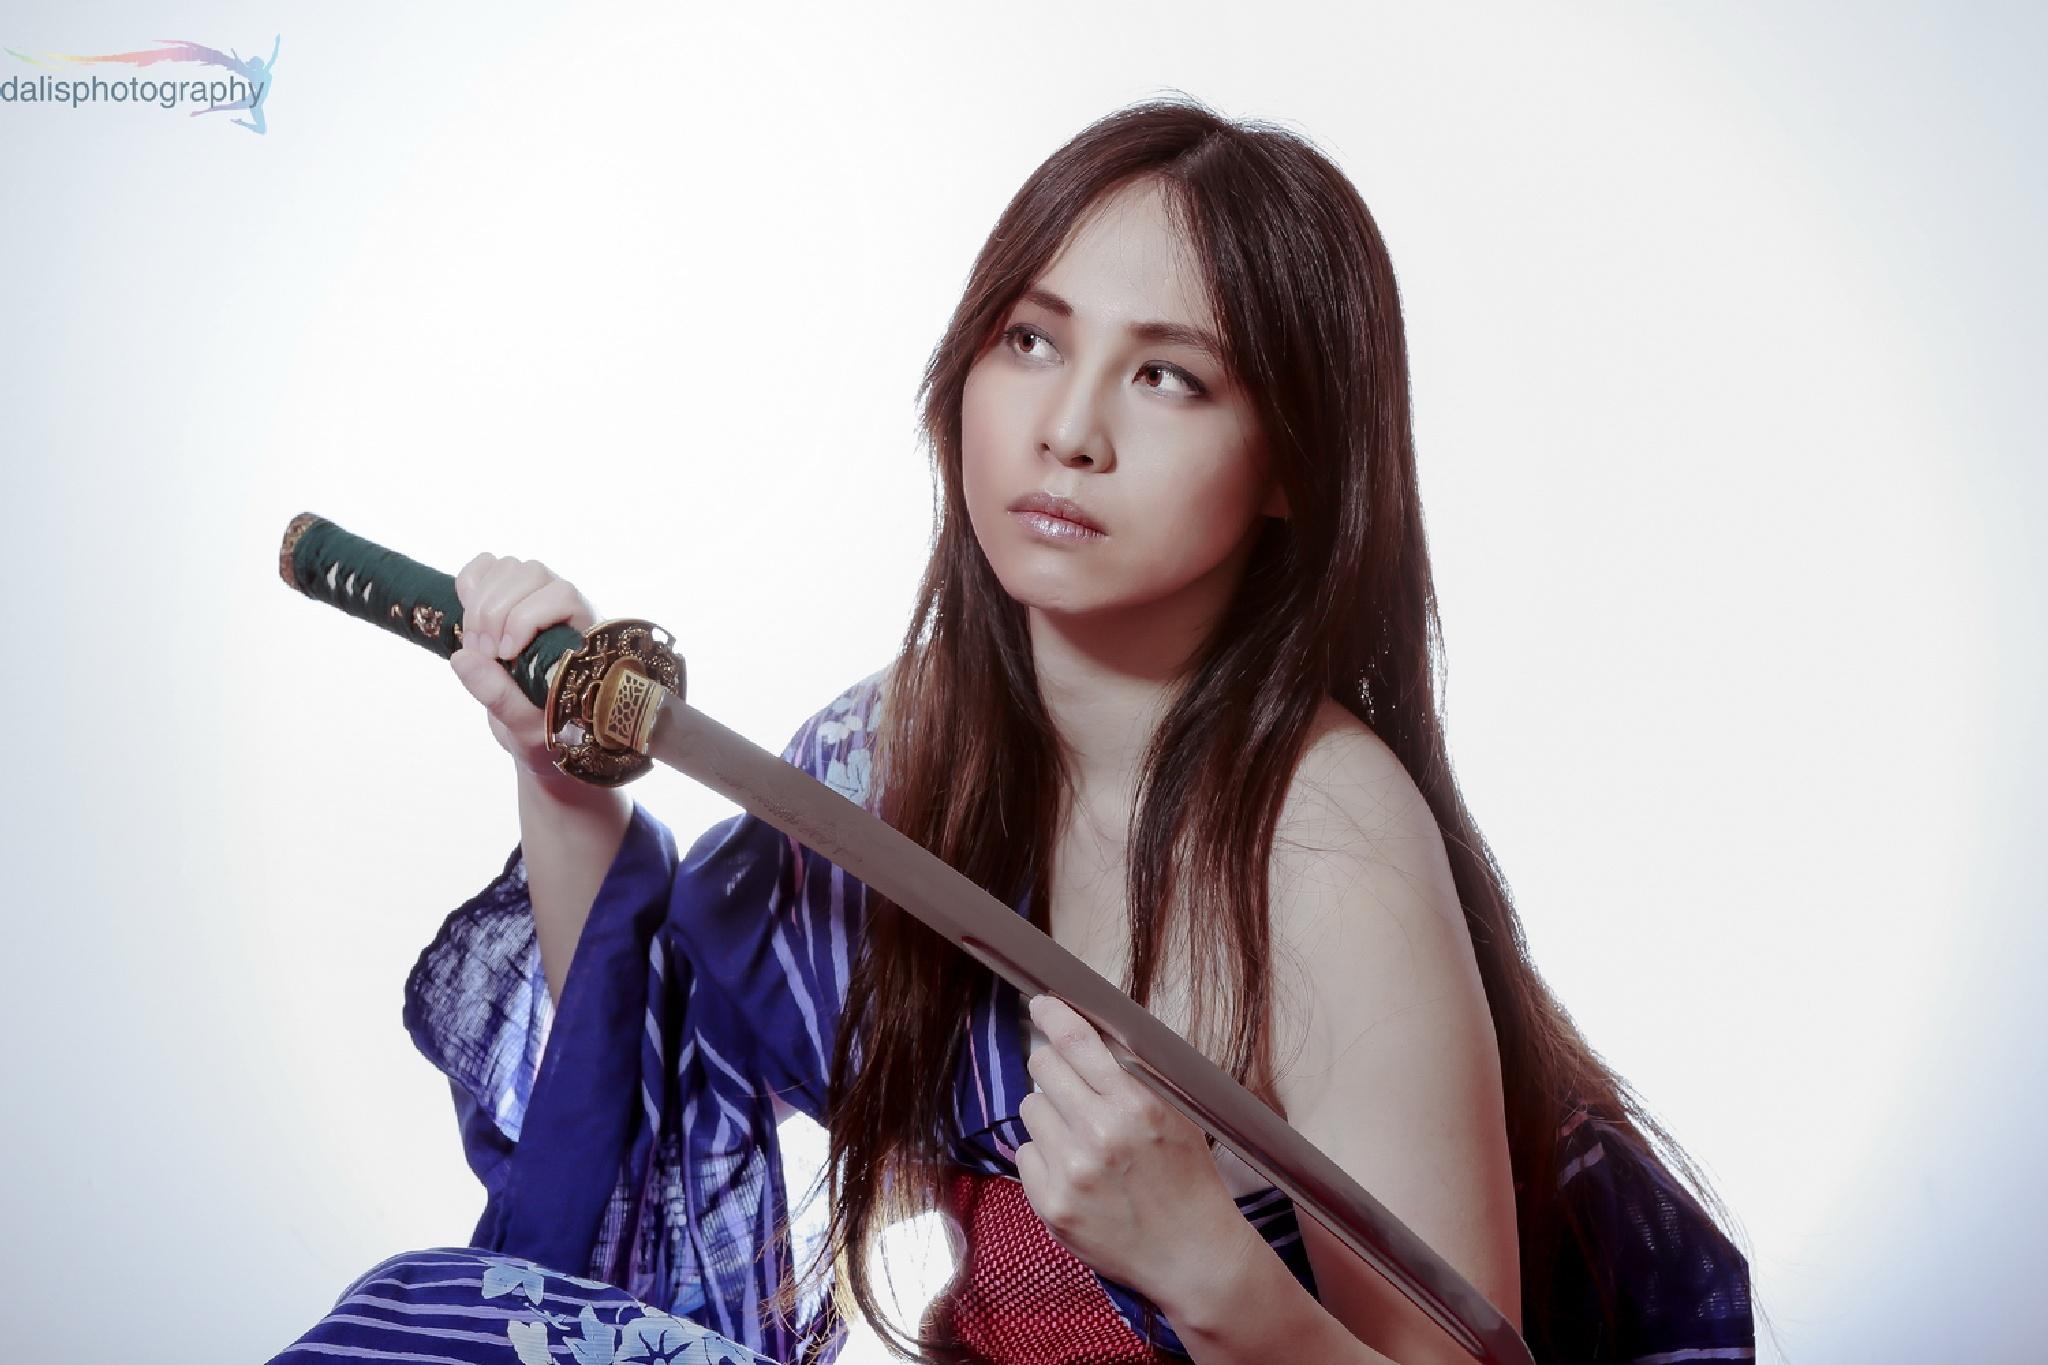 Samurai Girl by Eric Foto